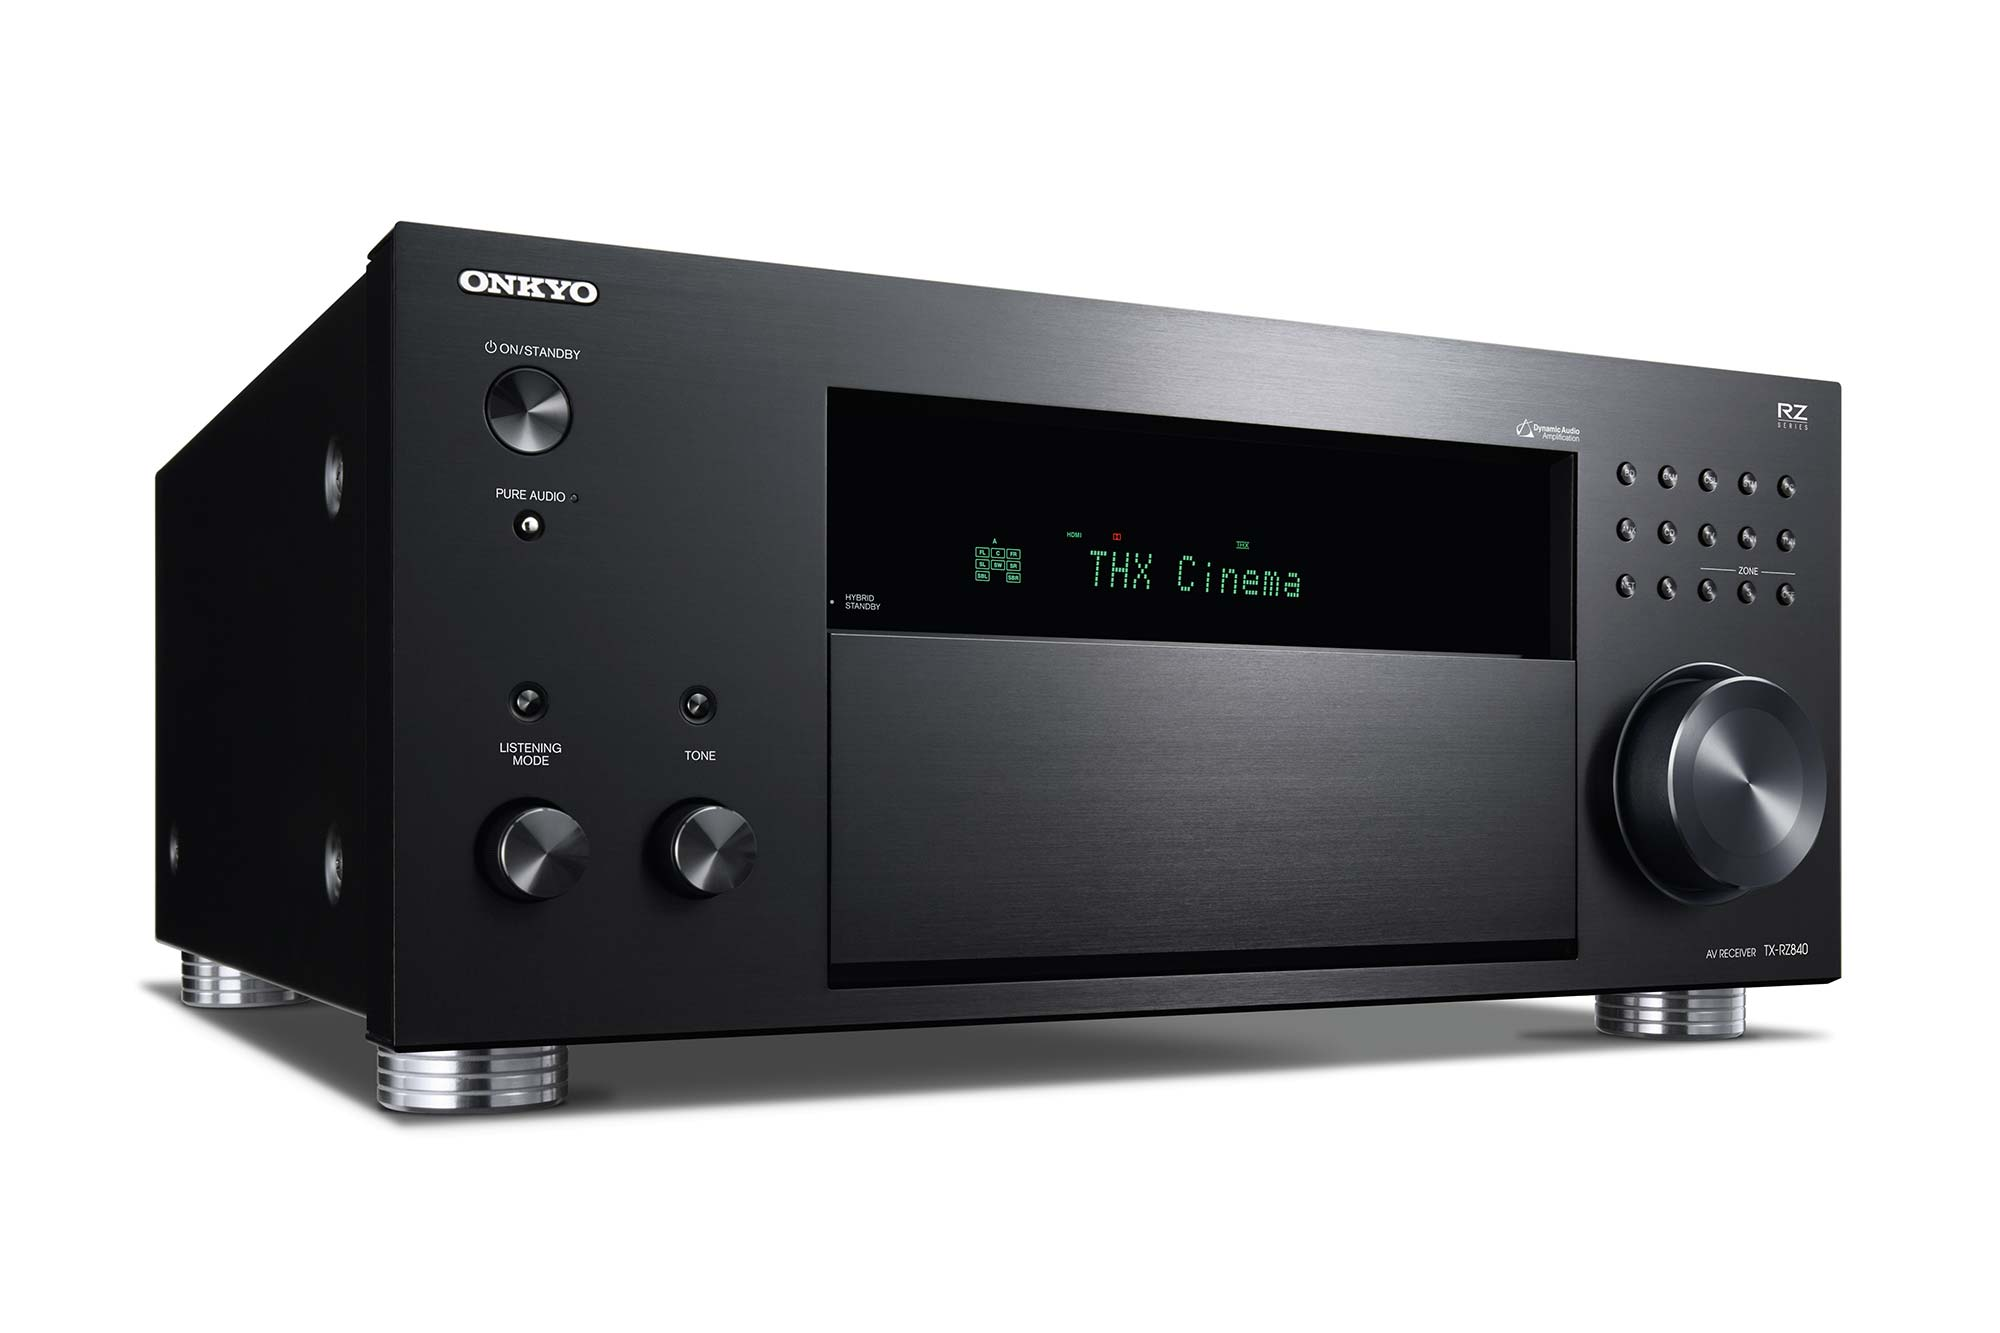 Onkyo AV-receiver TX-RZ840 Amazon Alexa update